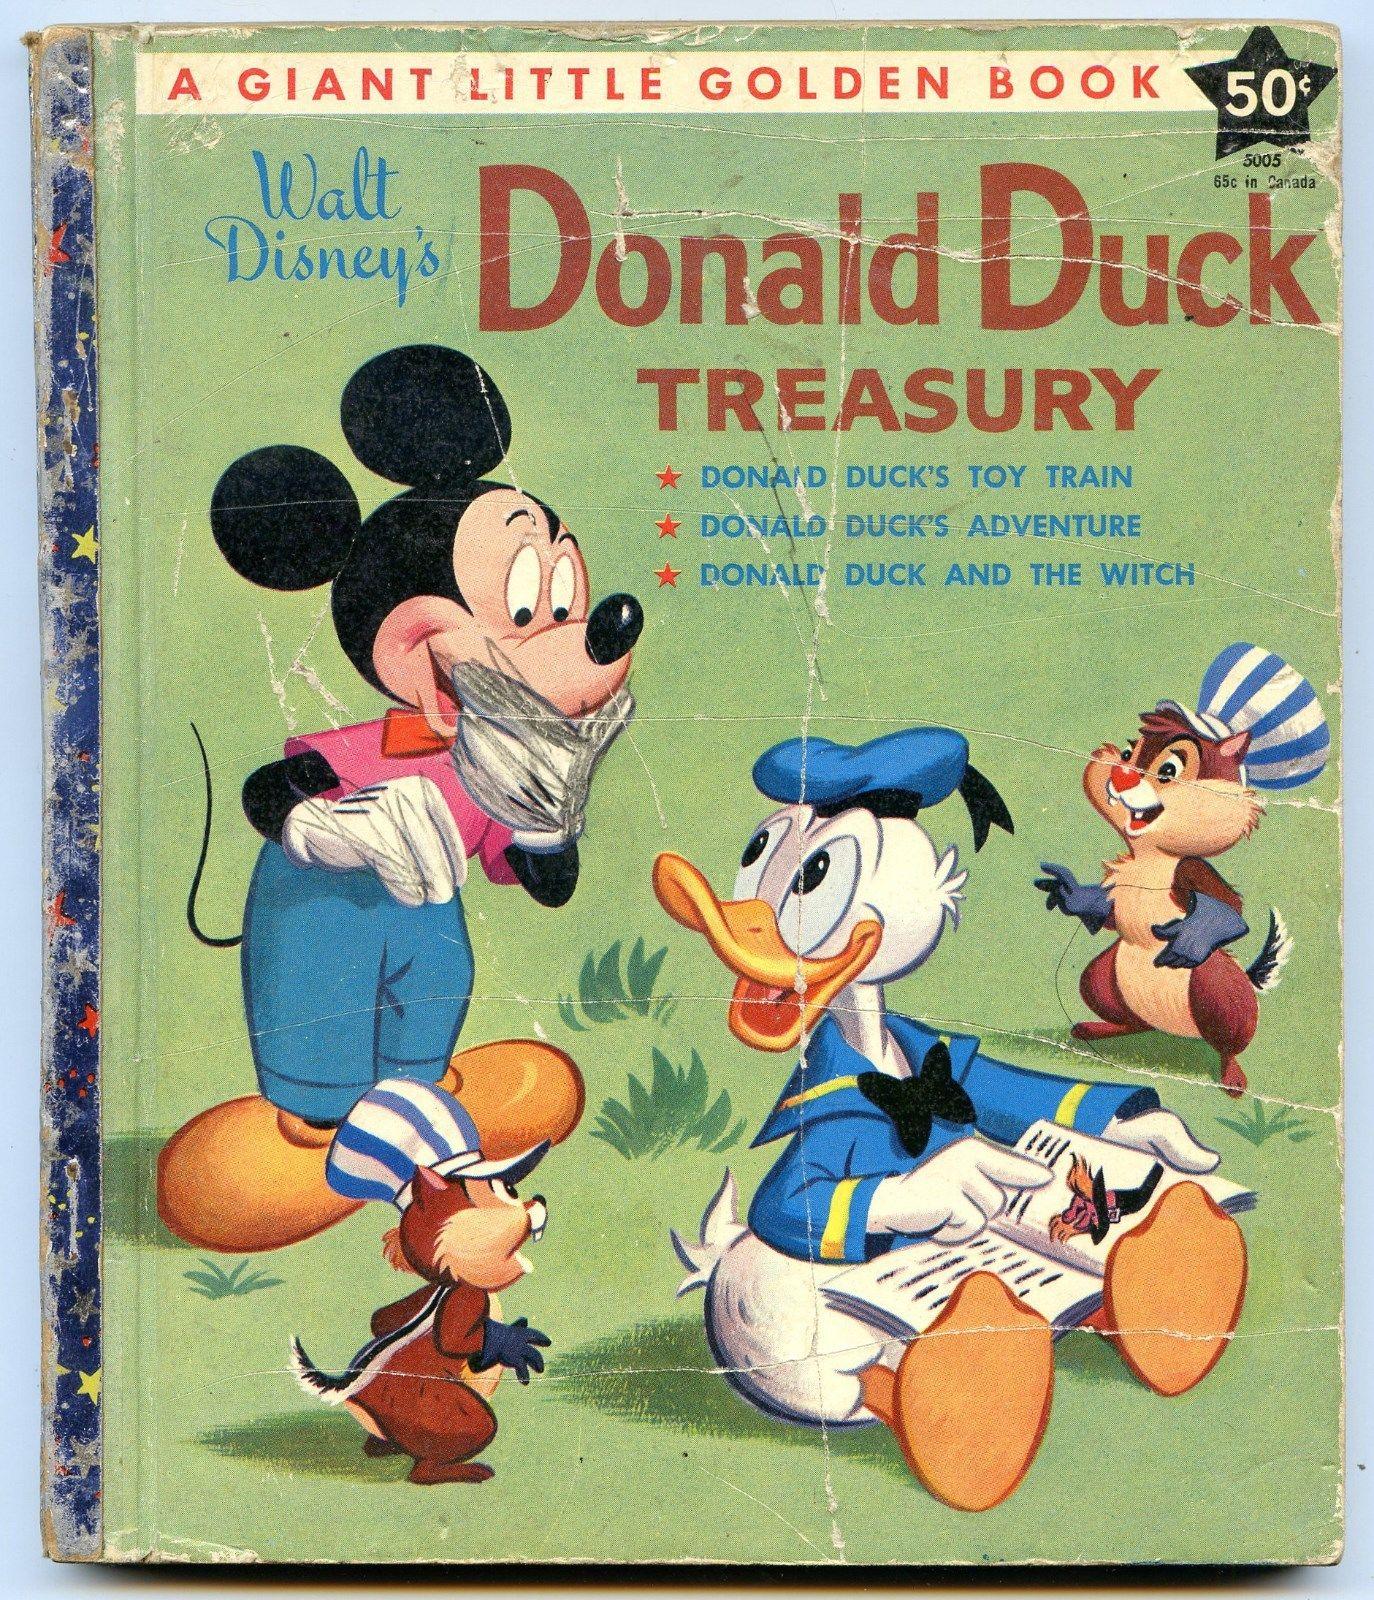 Walt Disney's Donald Duck Treasury